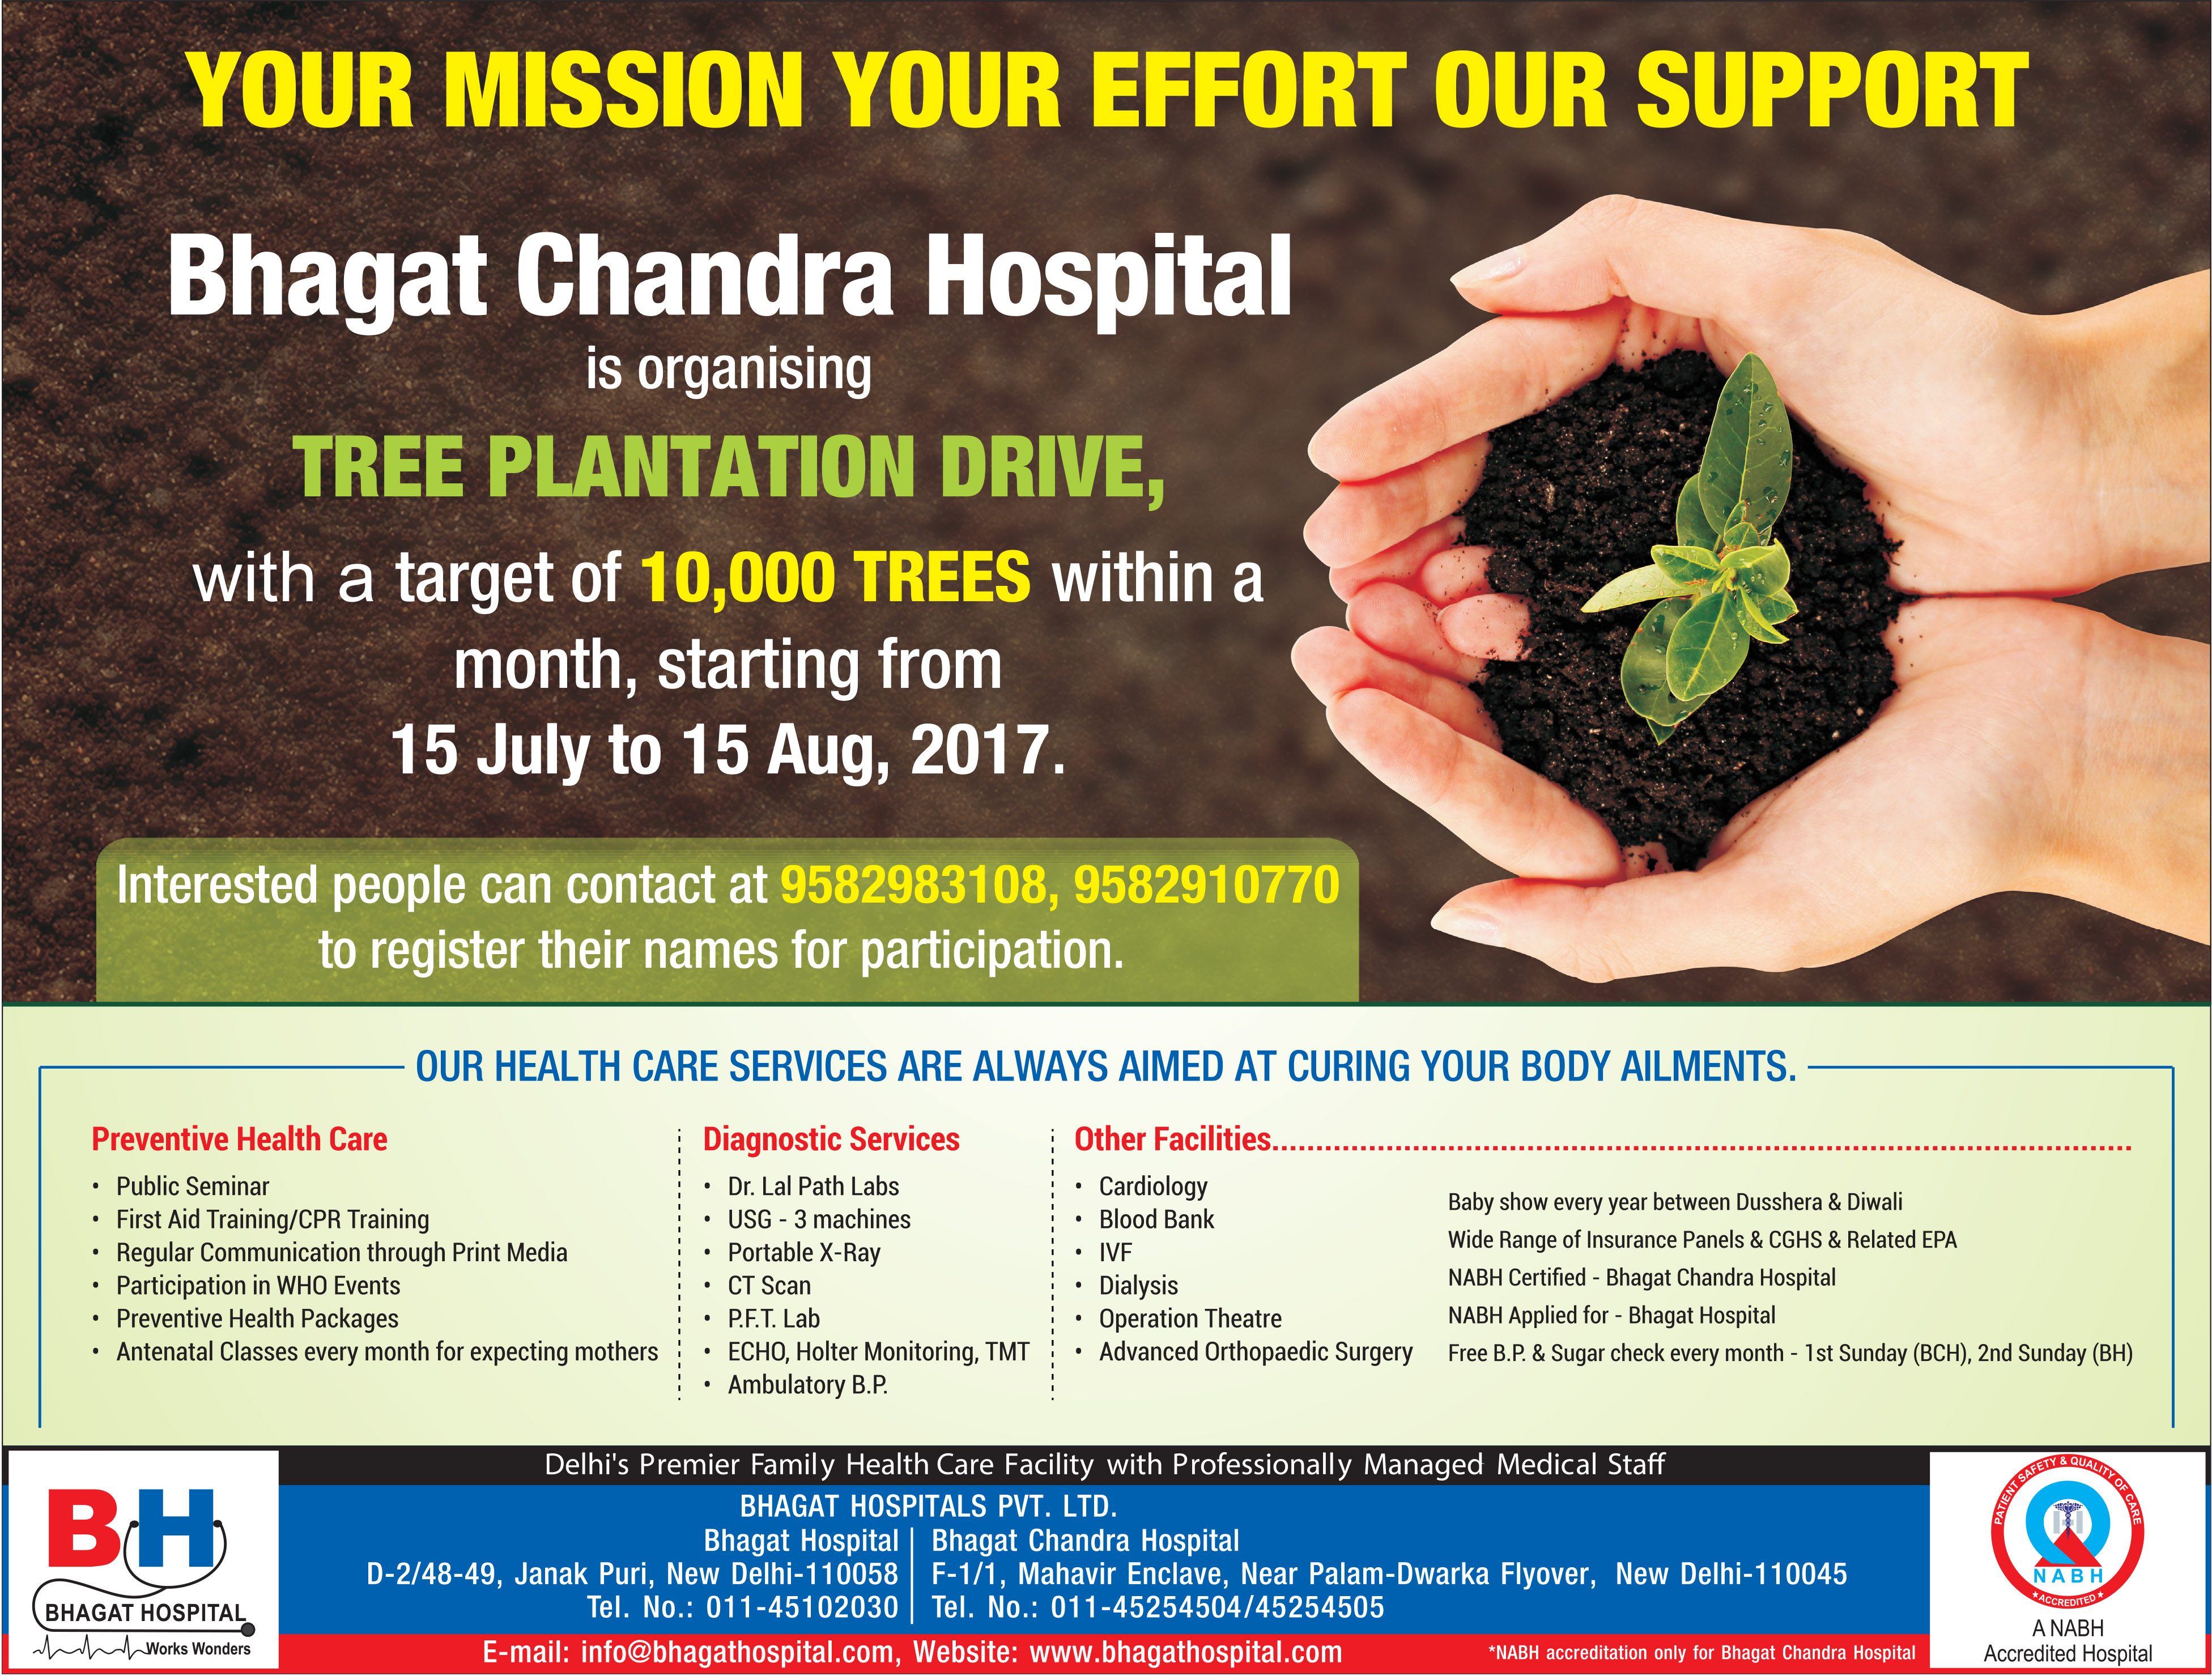 Bhagat Chandra Hospital